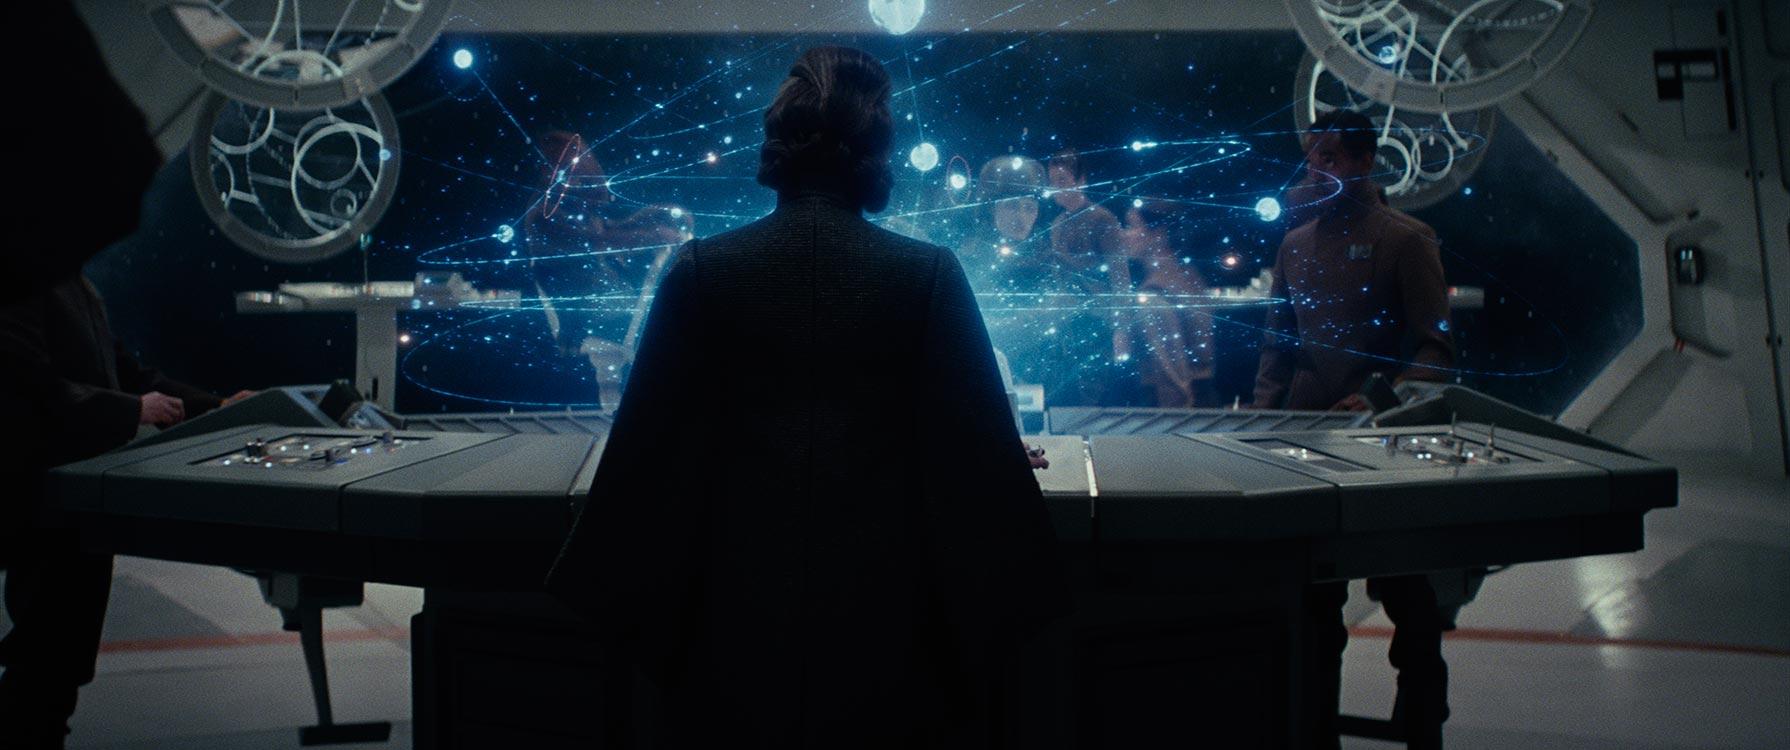 Star Wars: Os Últimos Jedi 03